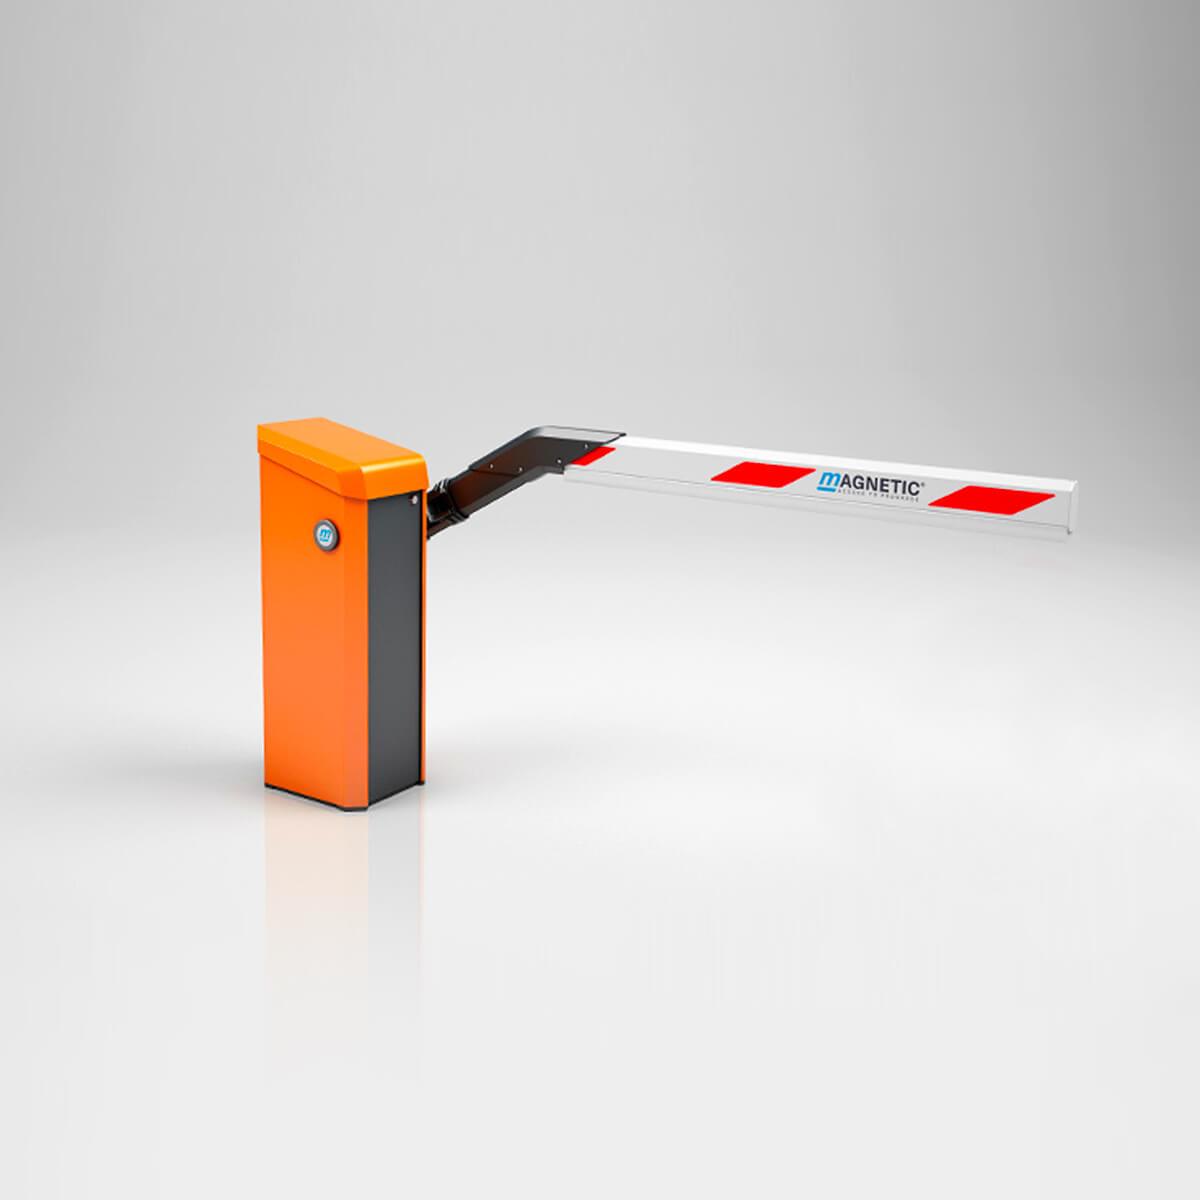 Buy Magnetic Access Barrier in UAE, Qatar and Saudi Arabia